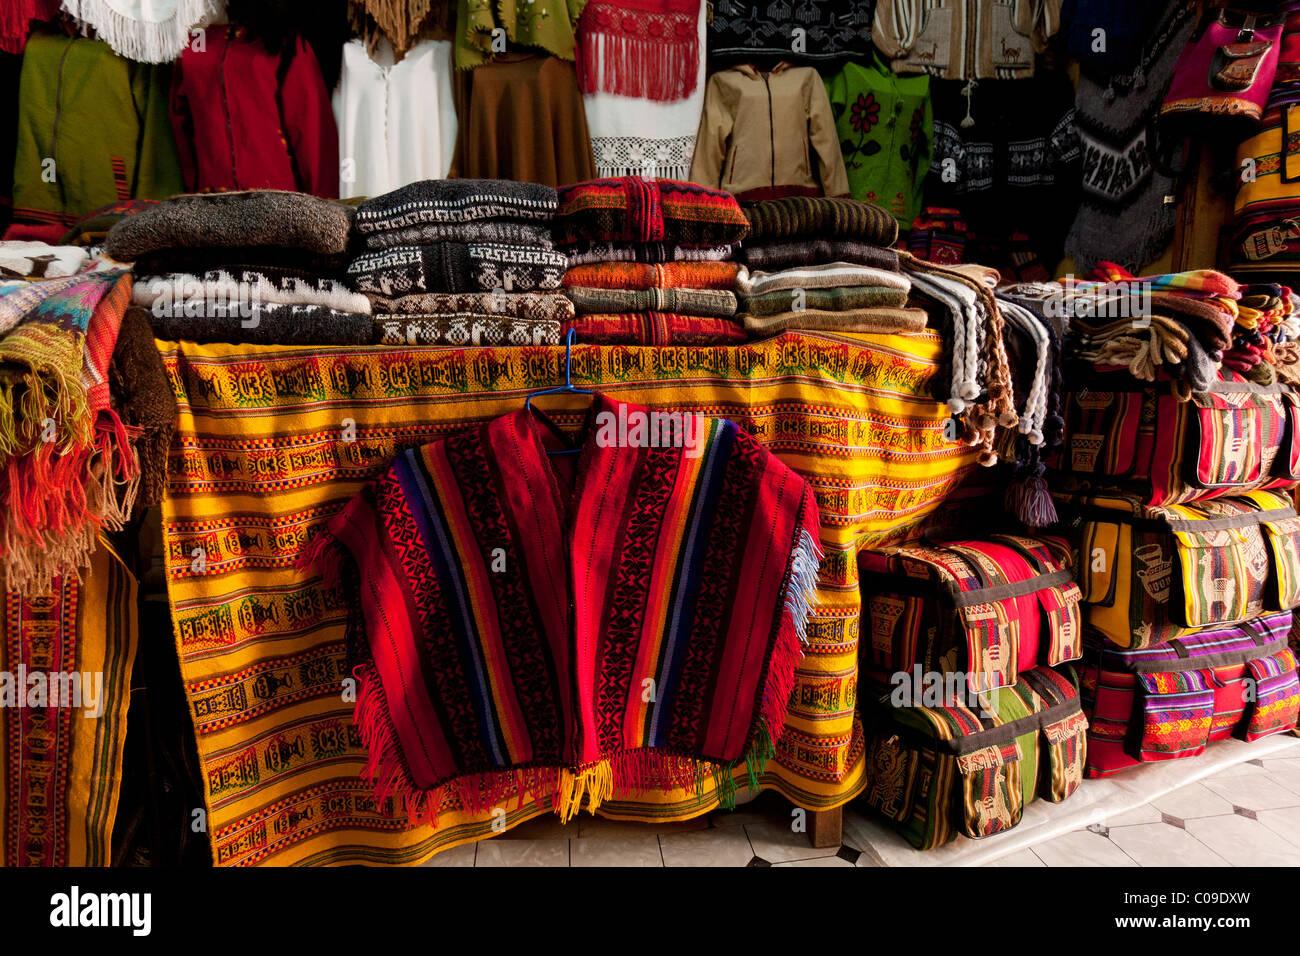 Alpaca Sweaters Stock Photos Alpaca Sweaters Stock Images Alamy